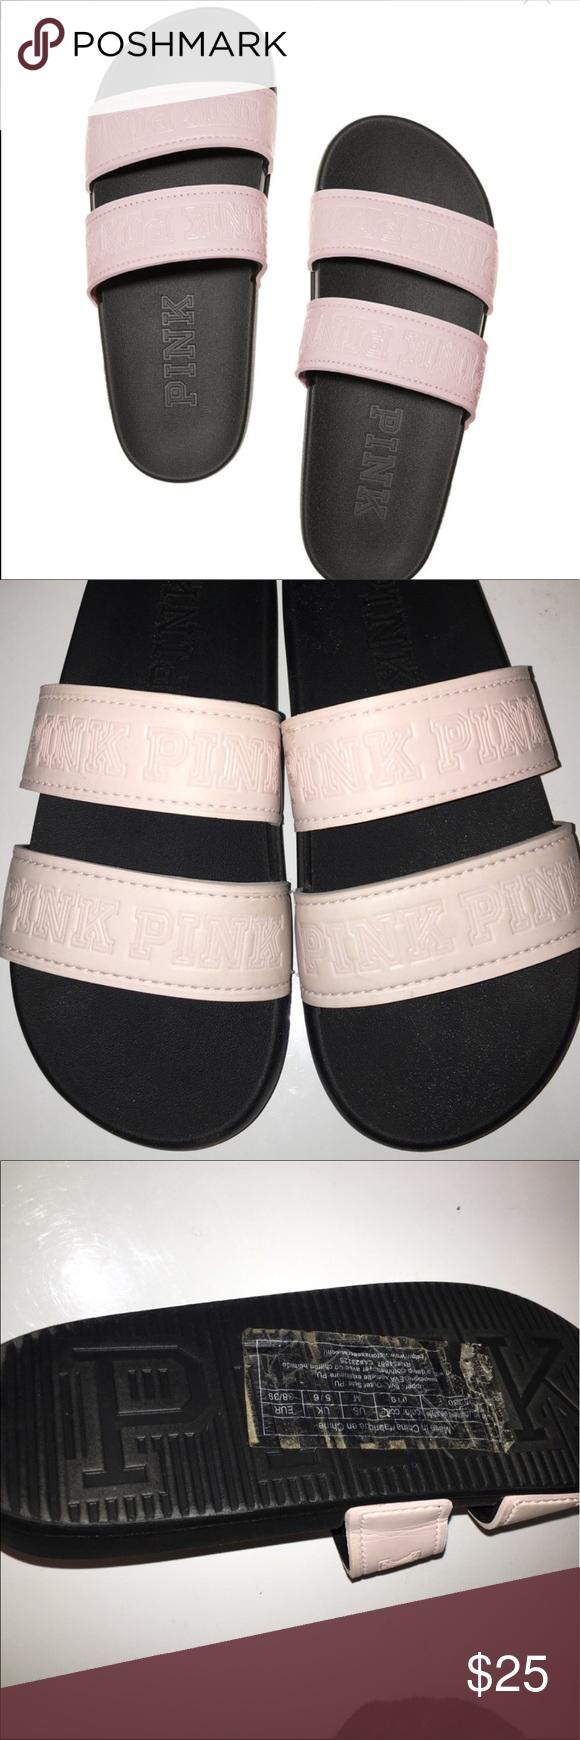 dcf4768521fff Victoria Secret Pink Slides Light Pink-Size Medium, fits 7-8. New ...